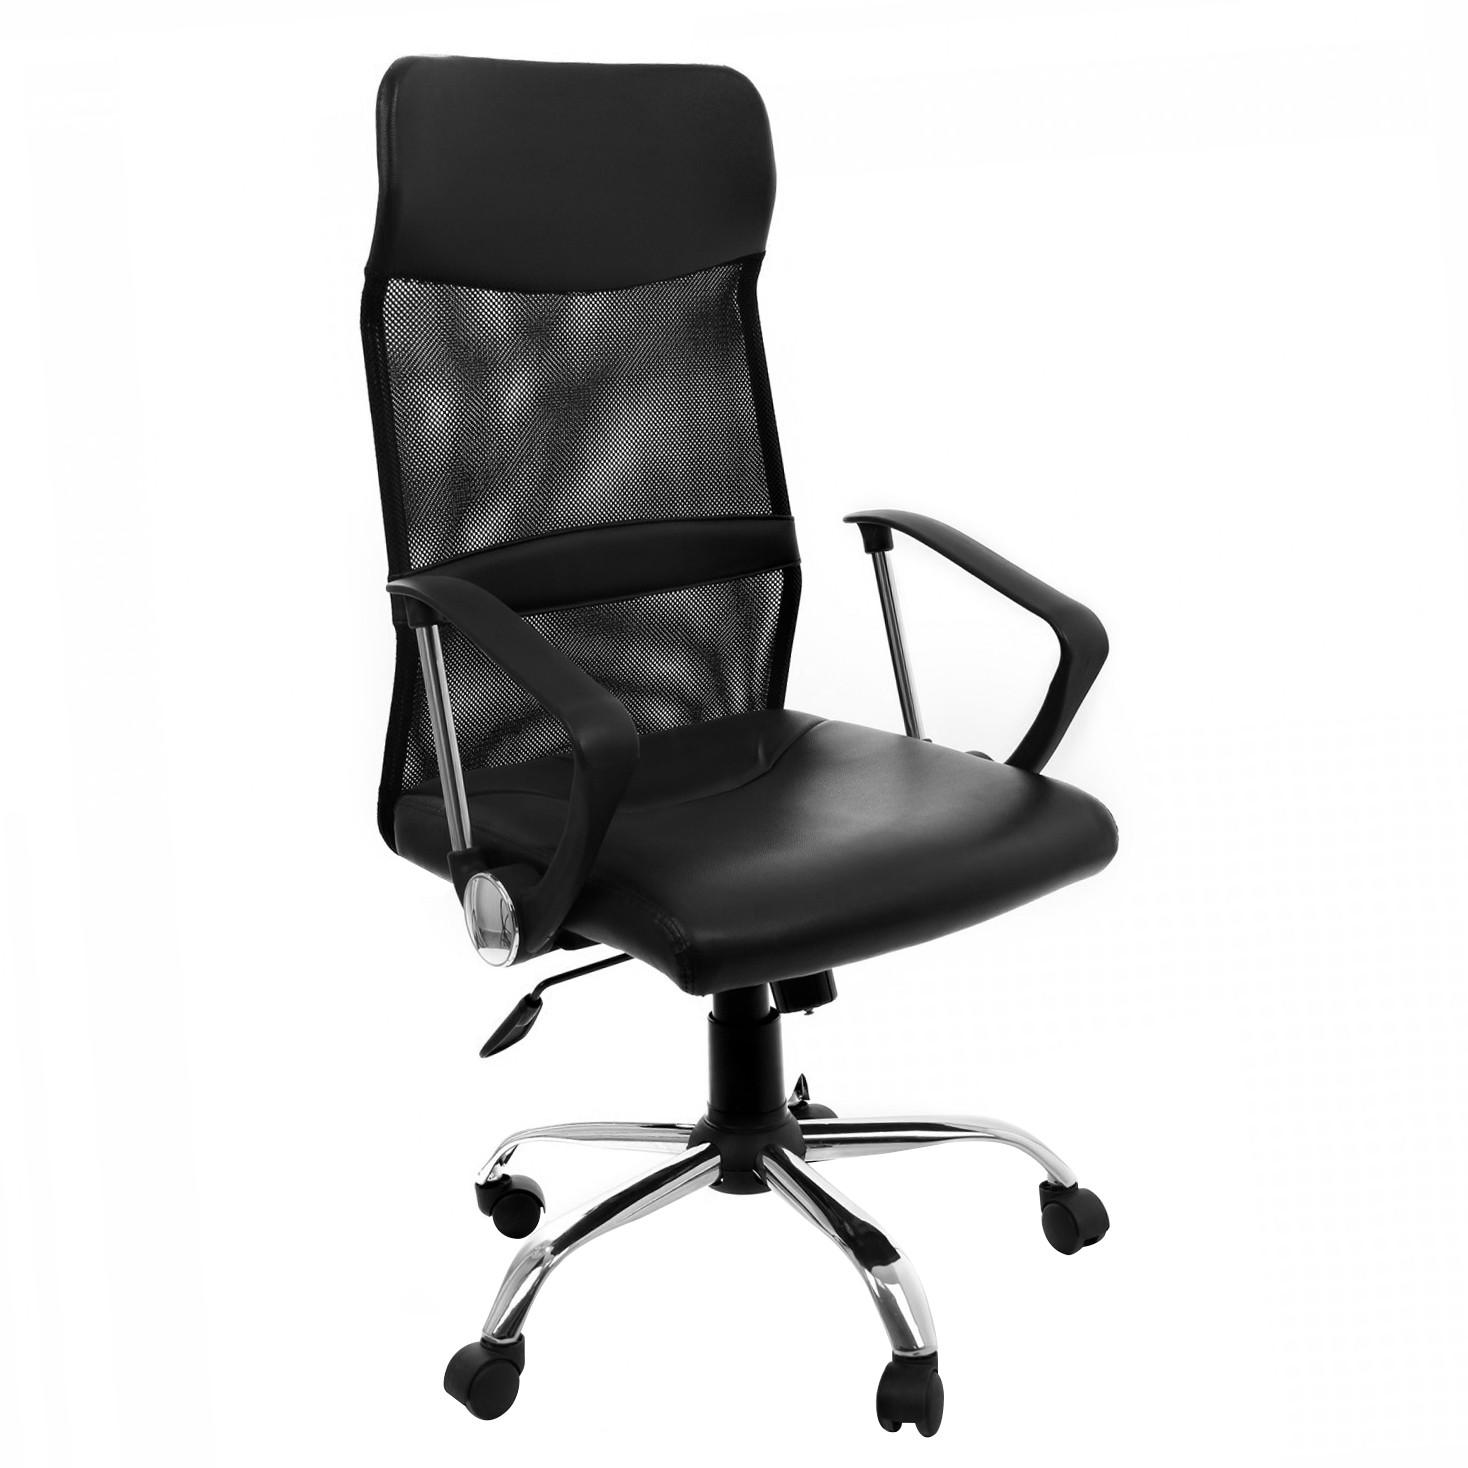 Scaun birou ergonomic Ares, rotativ, imitatie piele + mesh, negru